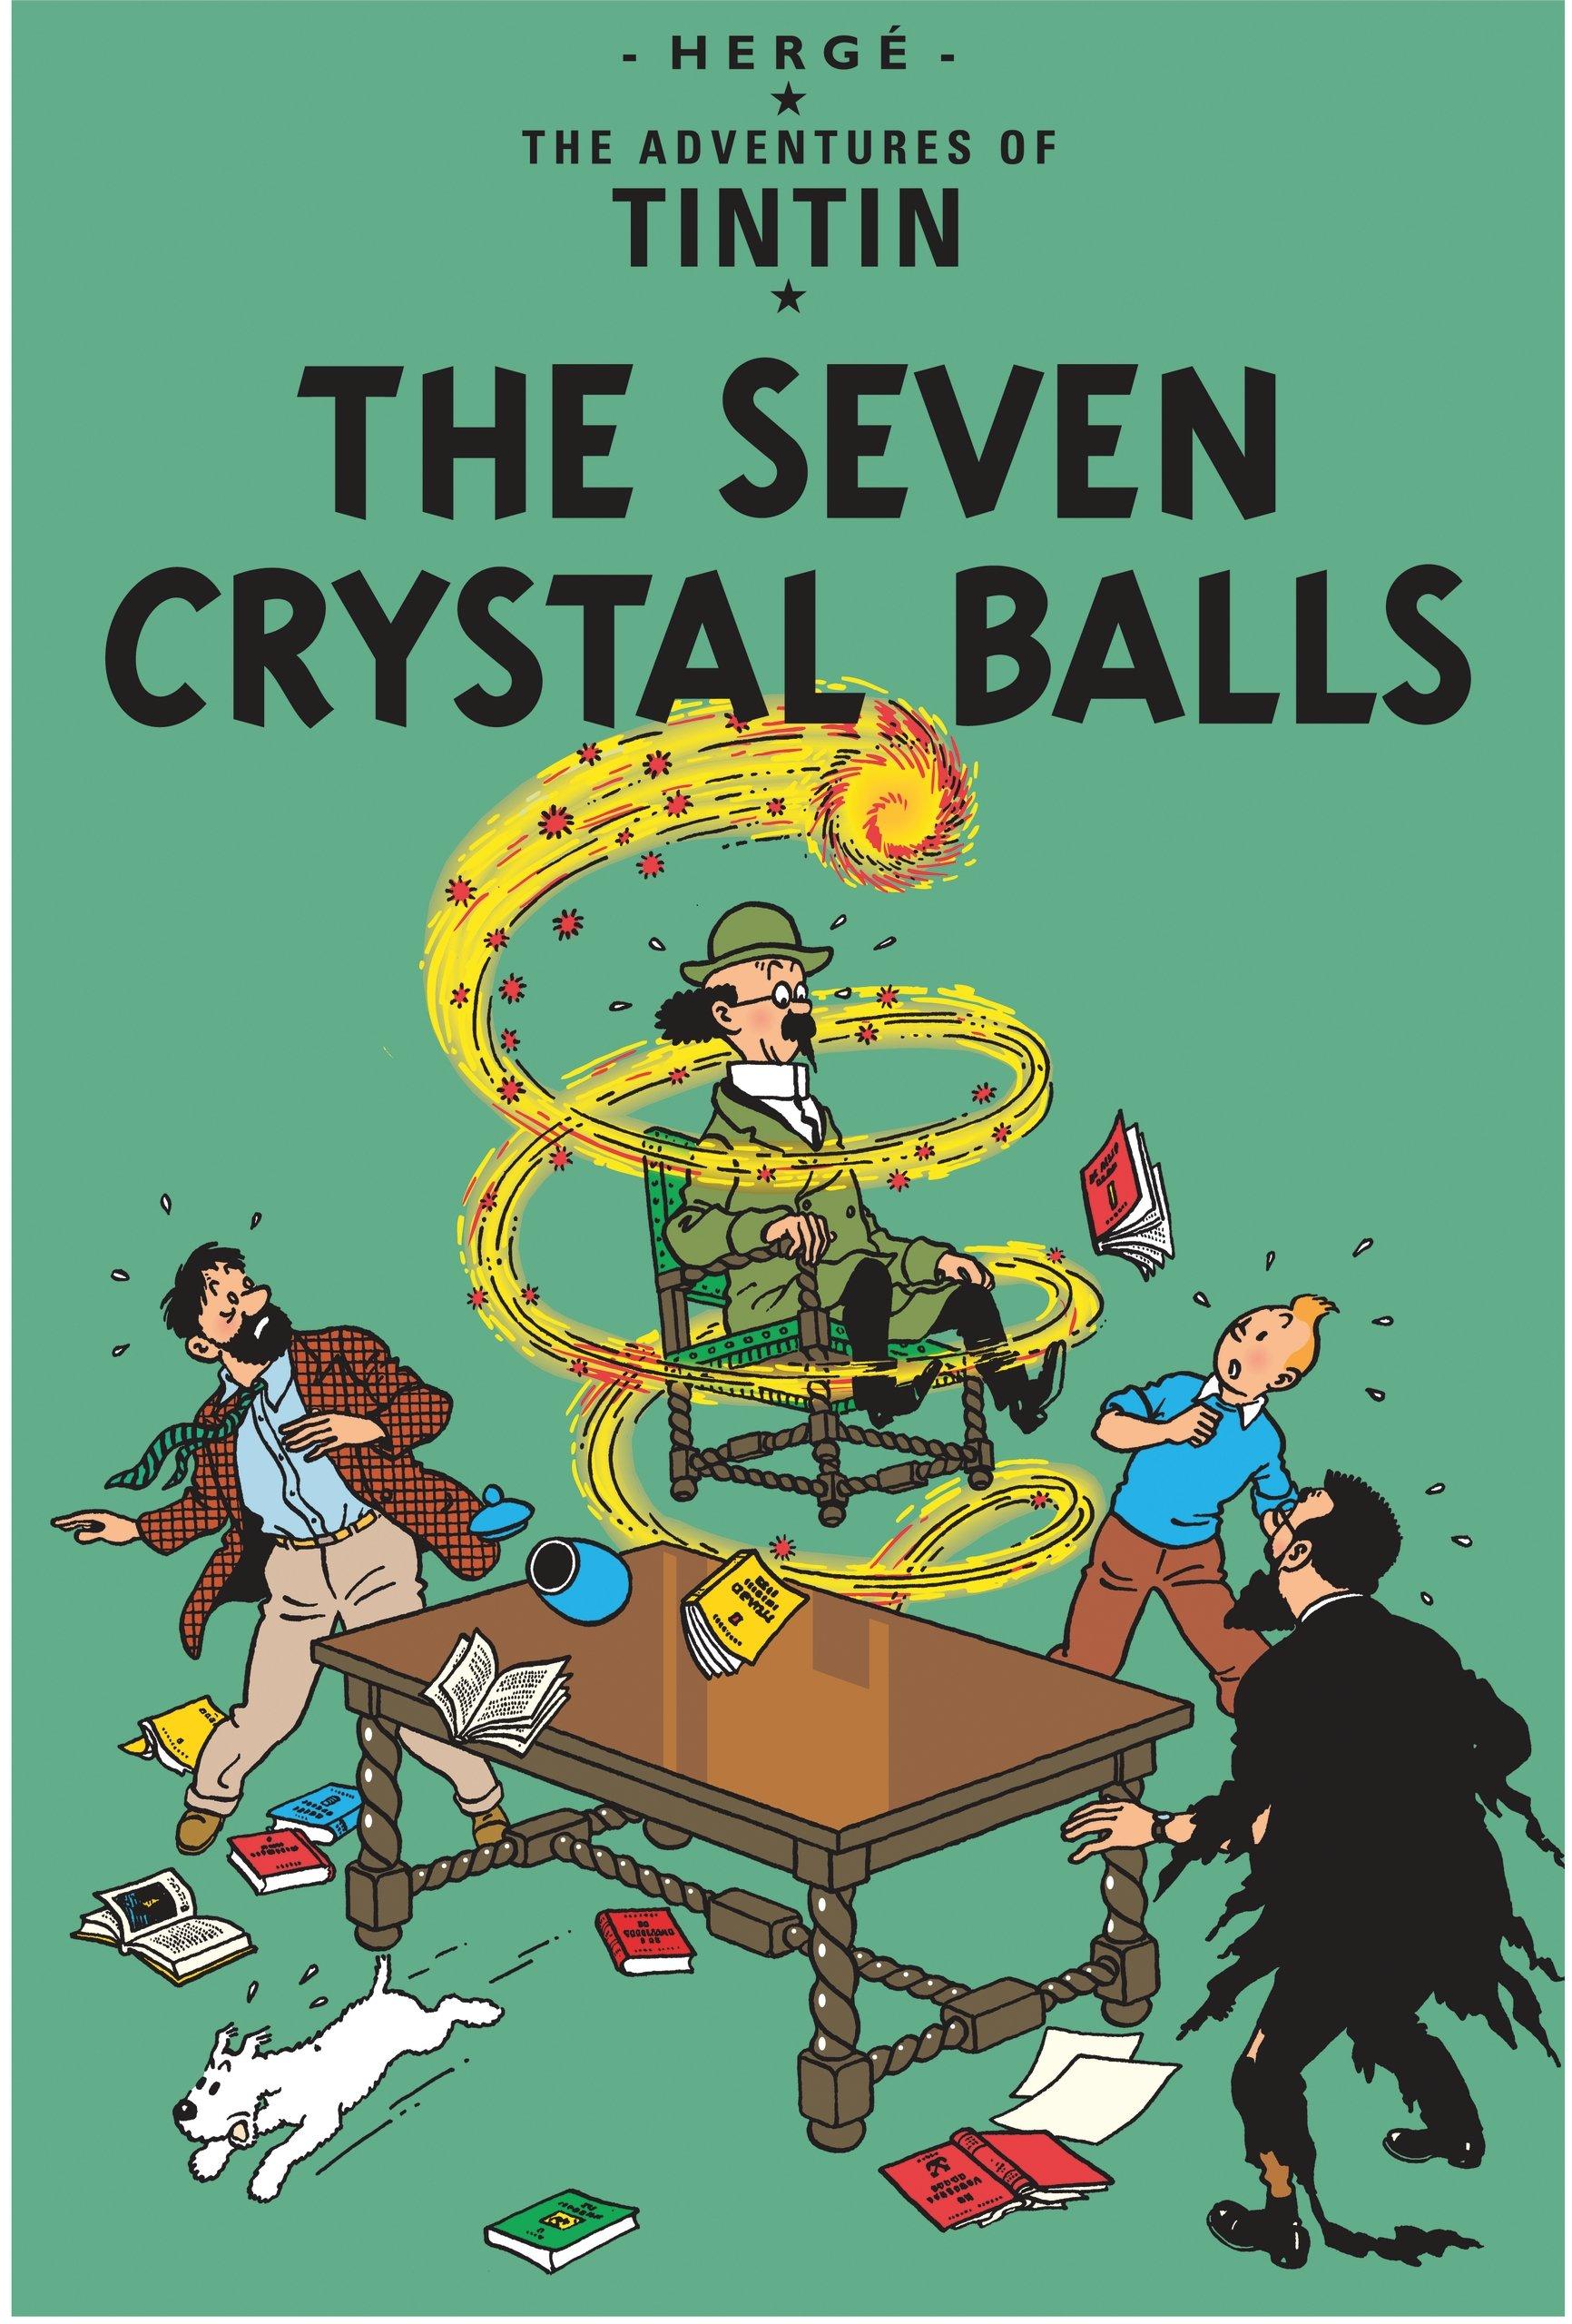 The Adventures of Tintin : The Seven Crystal Balls (Anglais) Broché – 29 août 1931 Herge Egmont Books Ltd 1405206241 empfohlenes Alter: ab 9 Jahre